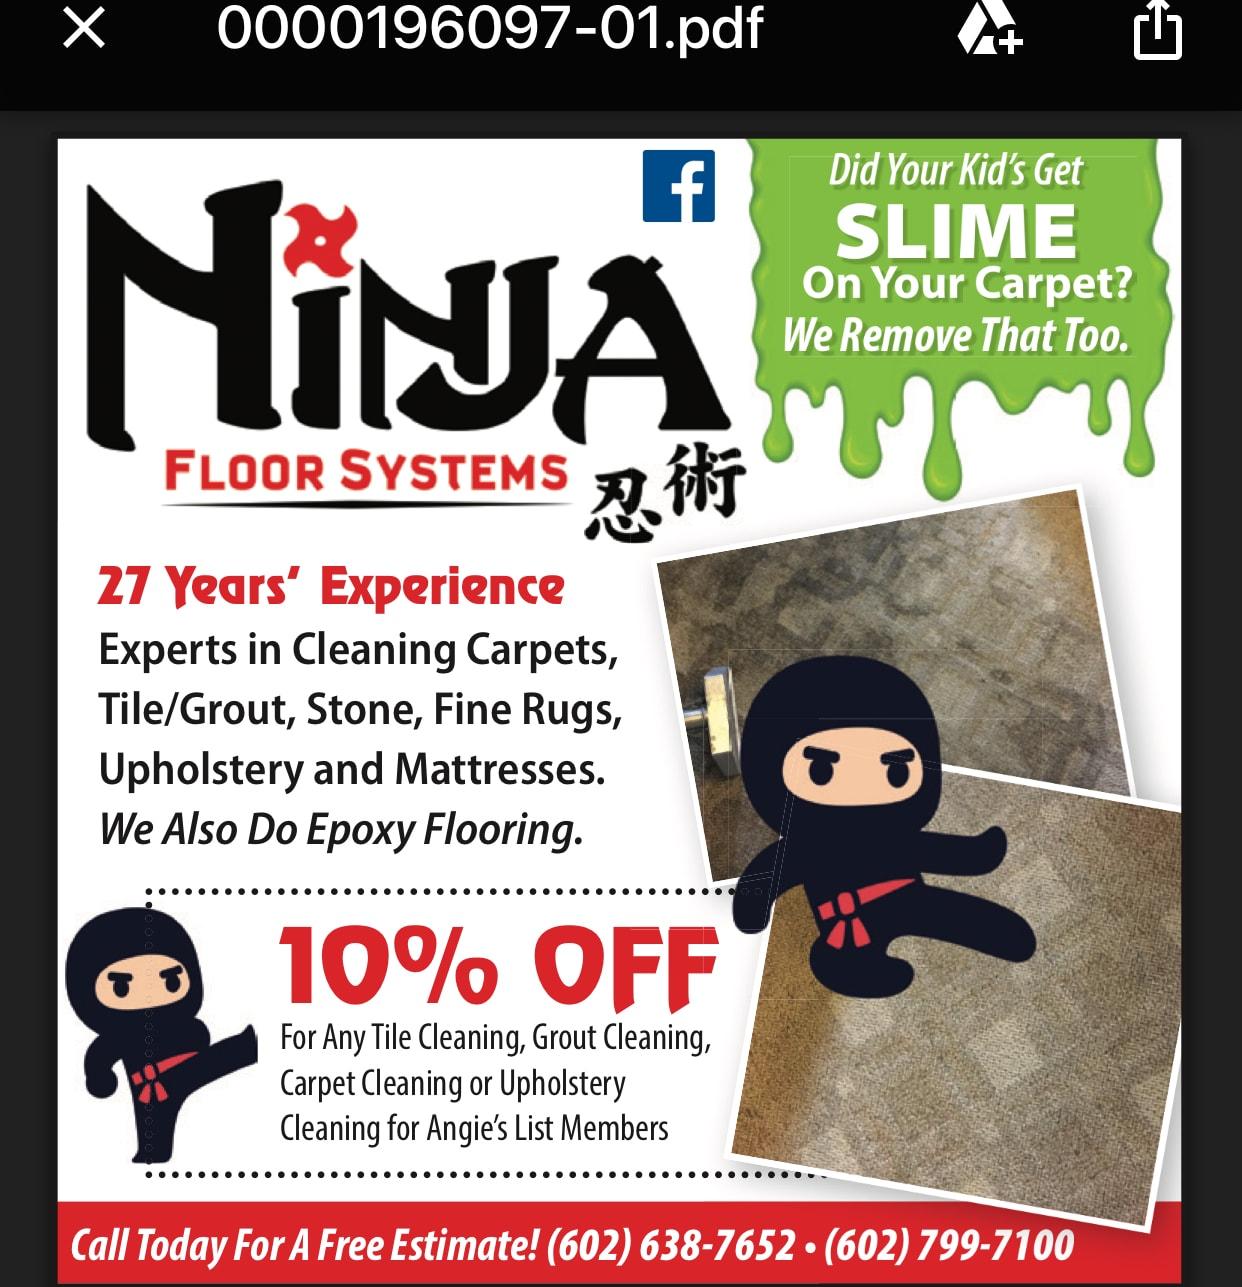 Ninja Restoration LLC., Tile & Carpet